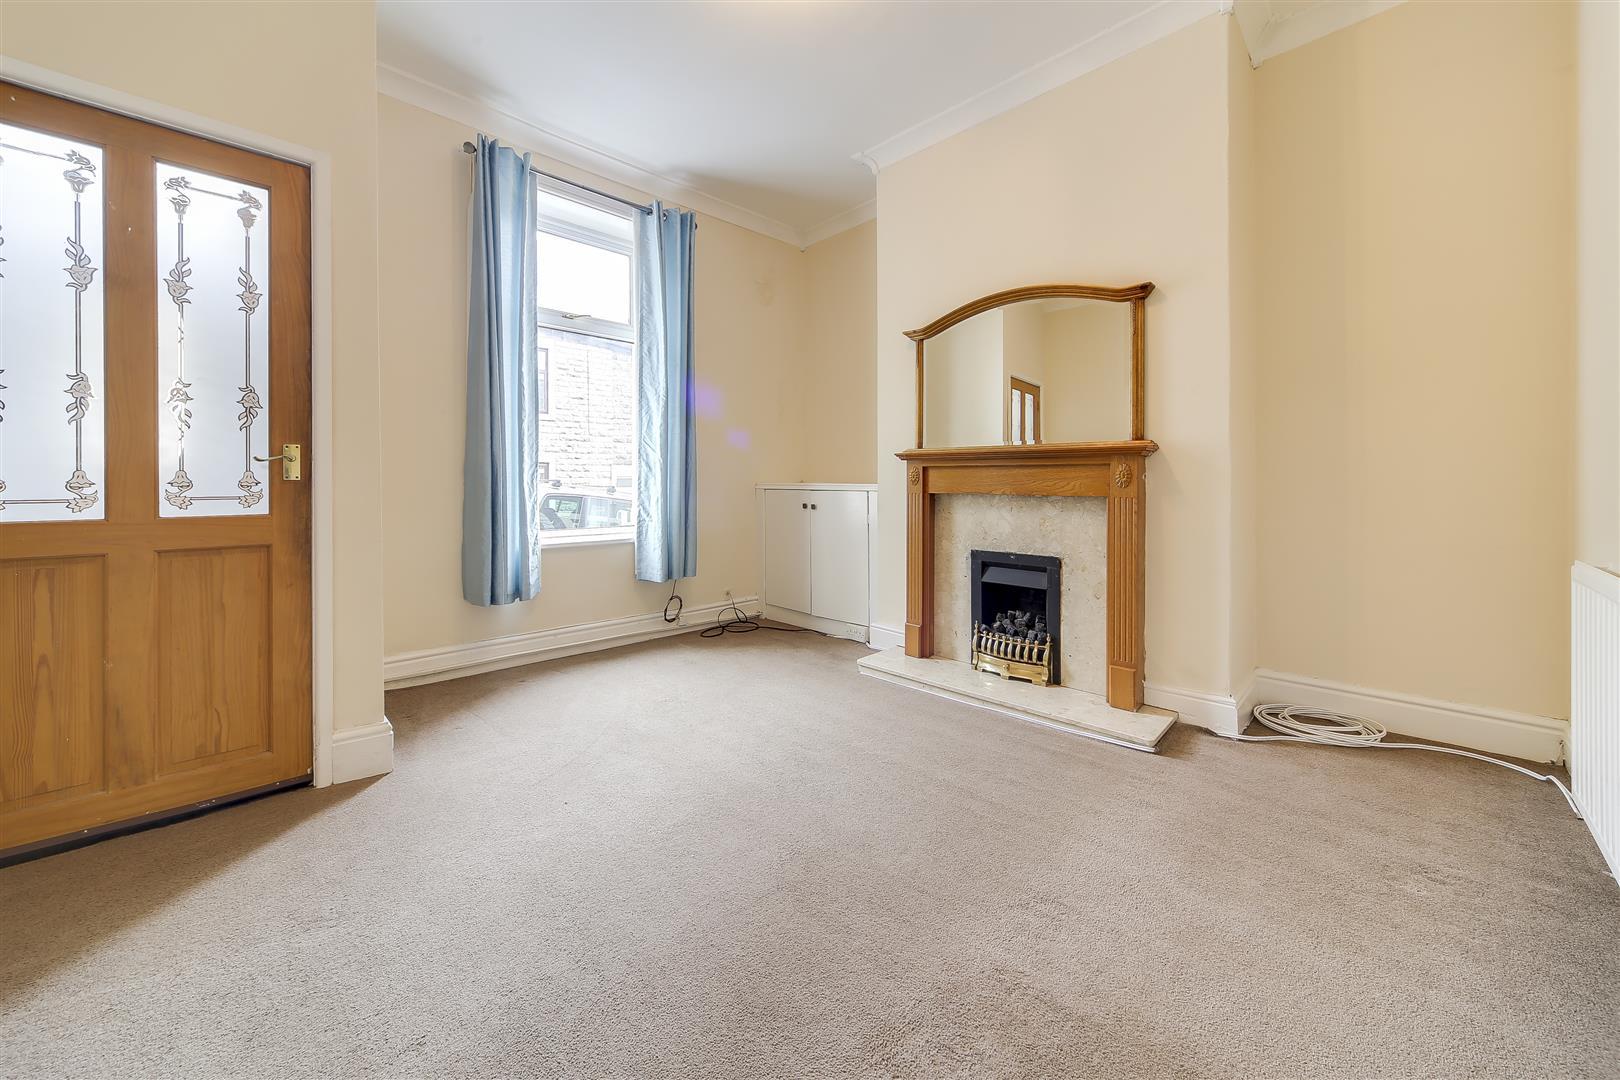 2 Bedrooms Terraced House for sale in Belgrave Street, Rising Bridge, Accrington